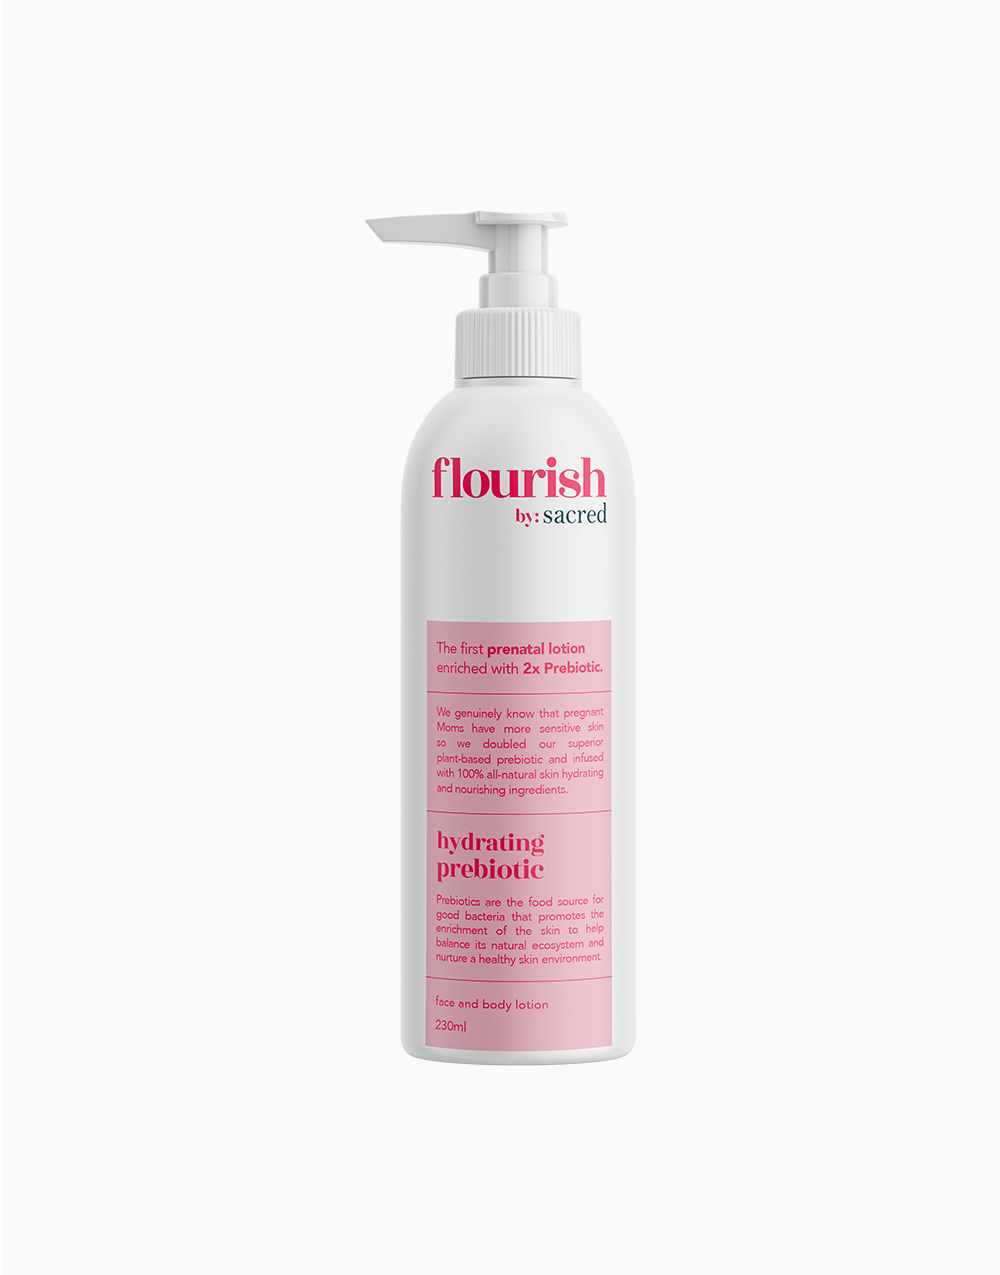 Flourish Prebiotic Lotion (230ml) by Sacred